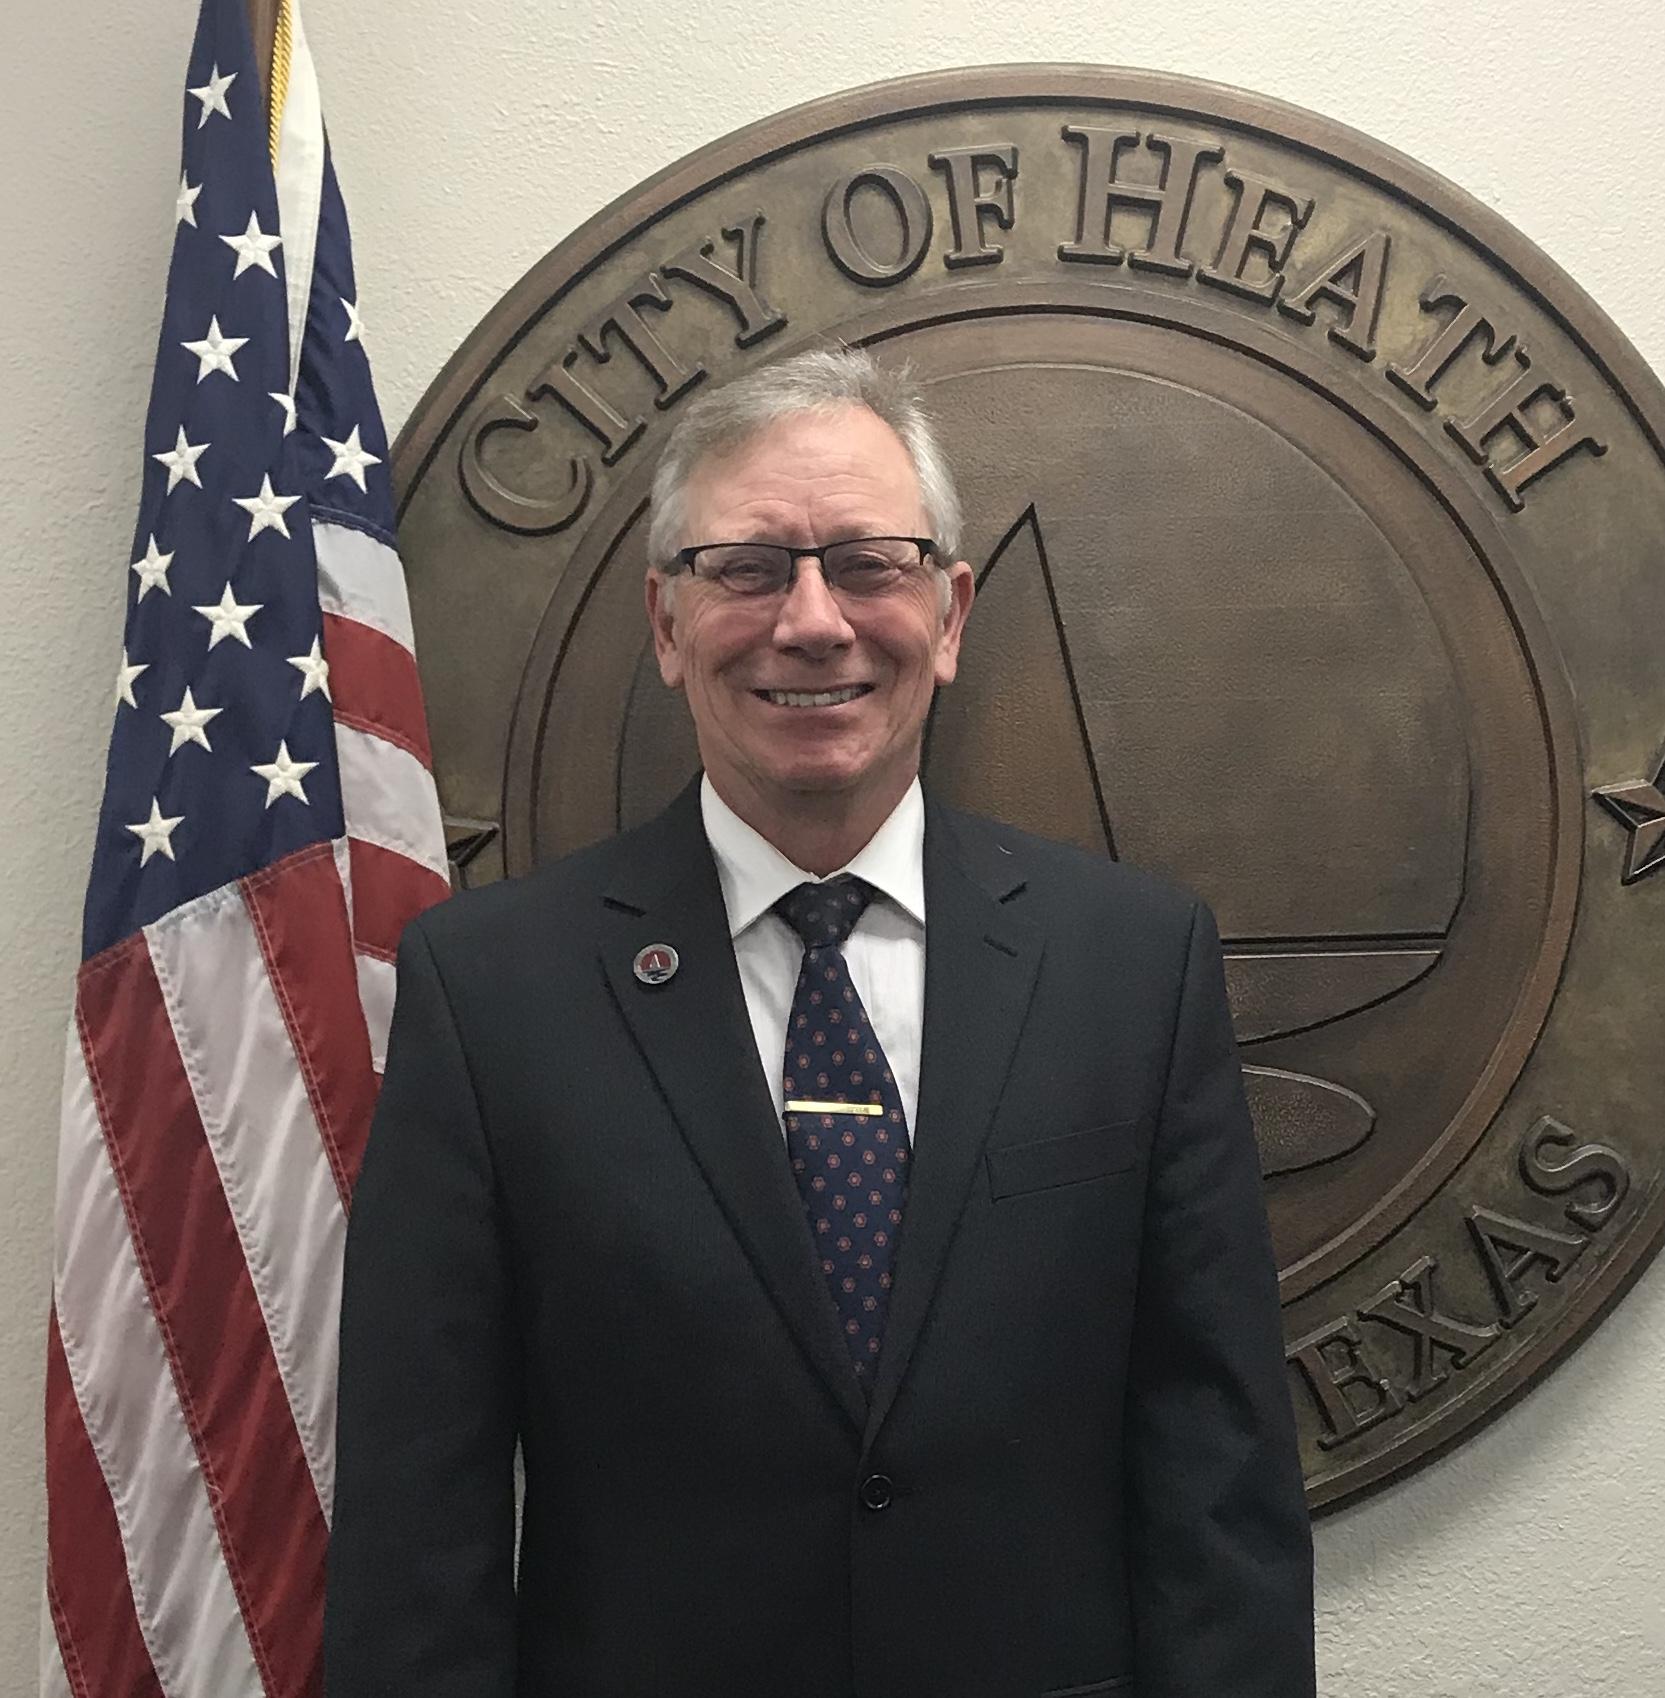 Heath Mayor Pro-Tem Rich Krause Announces He Will Seek Re-Election